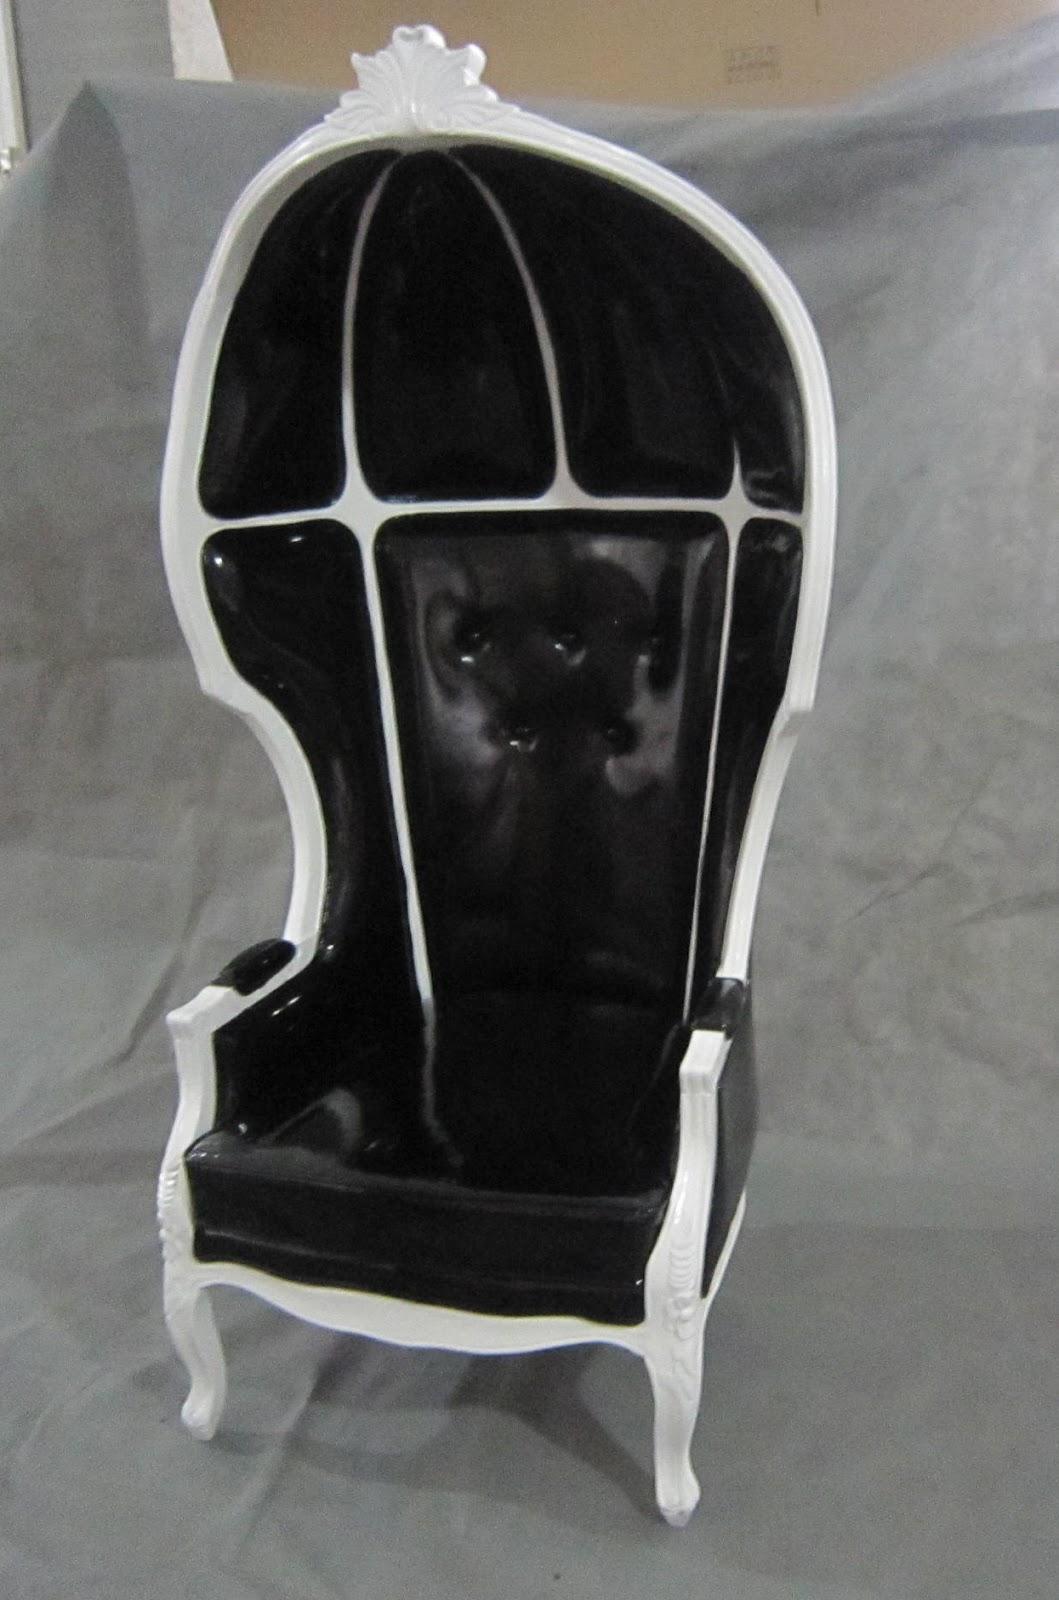 Black Velvet Throne Chair Dining Chairs With Wheels For Elderly The Mod Spot Group Order On Custom 999 00